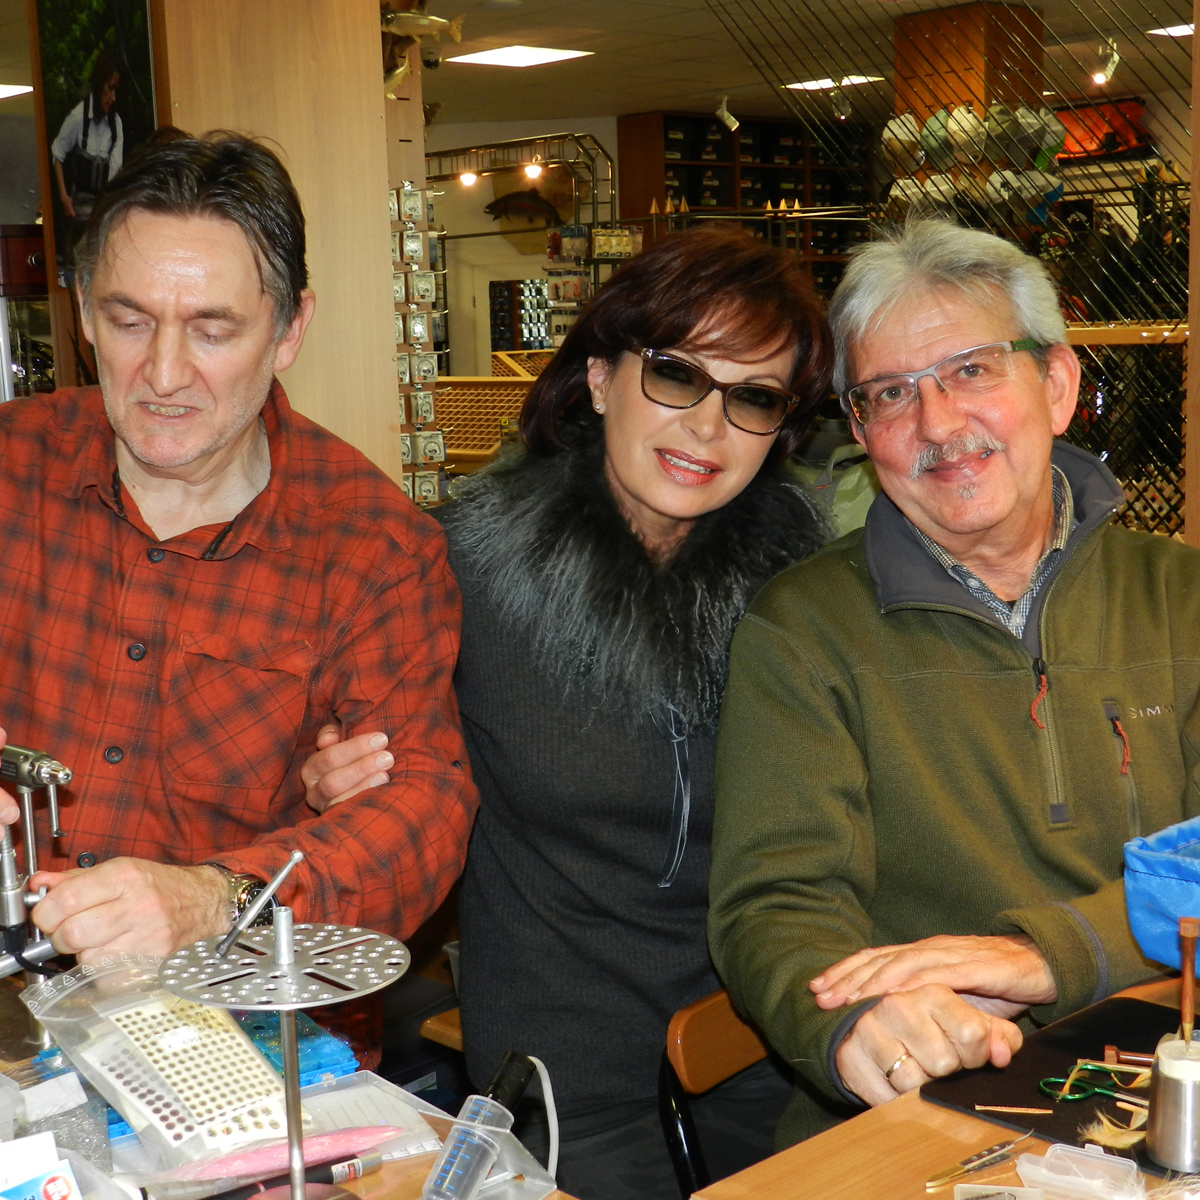 Peter Joest, Mirjana Pavlic und Günni Sareyka